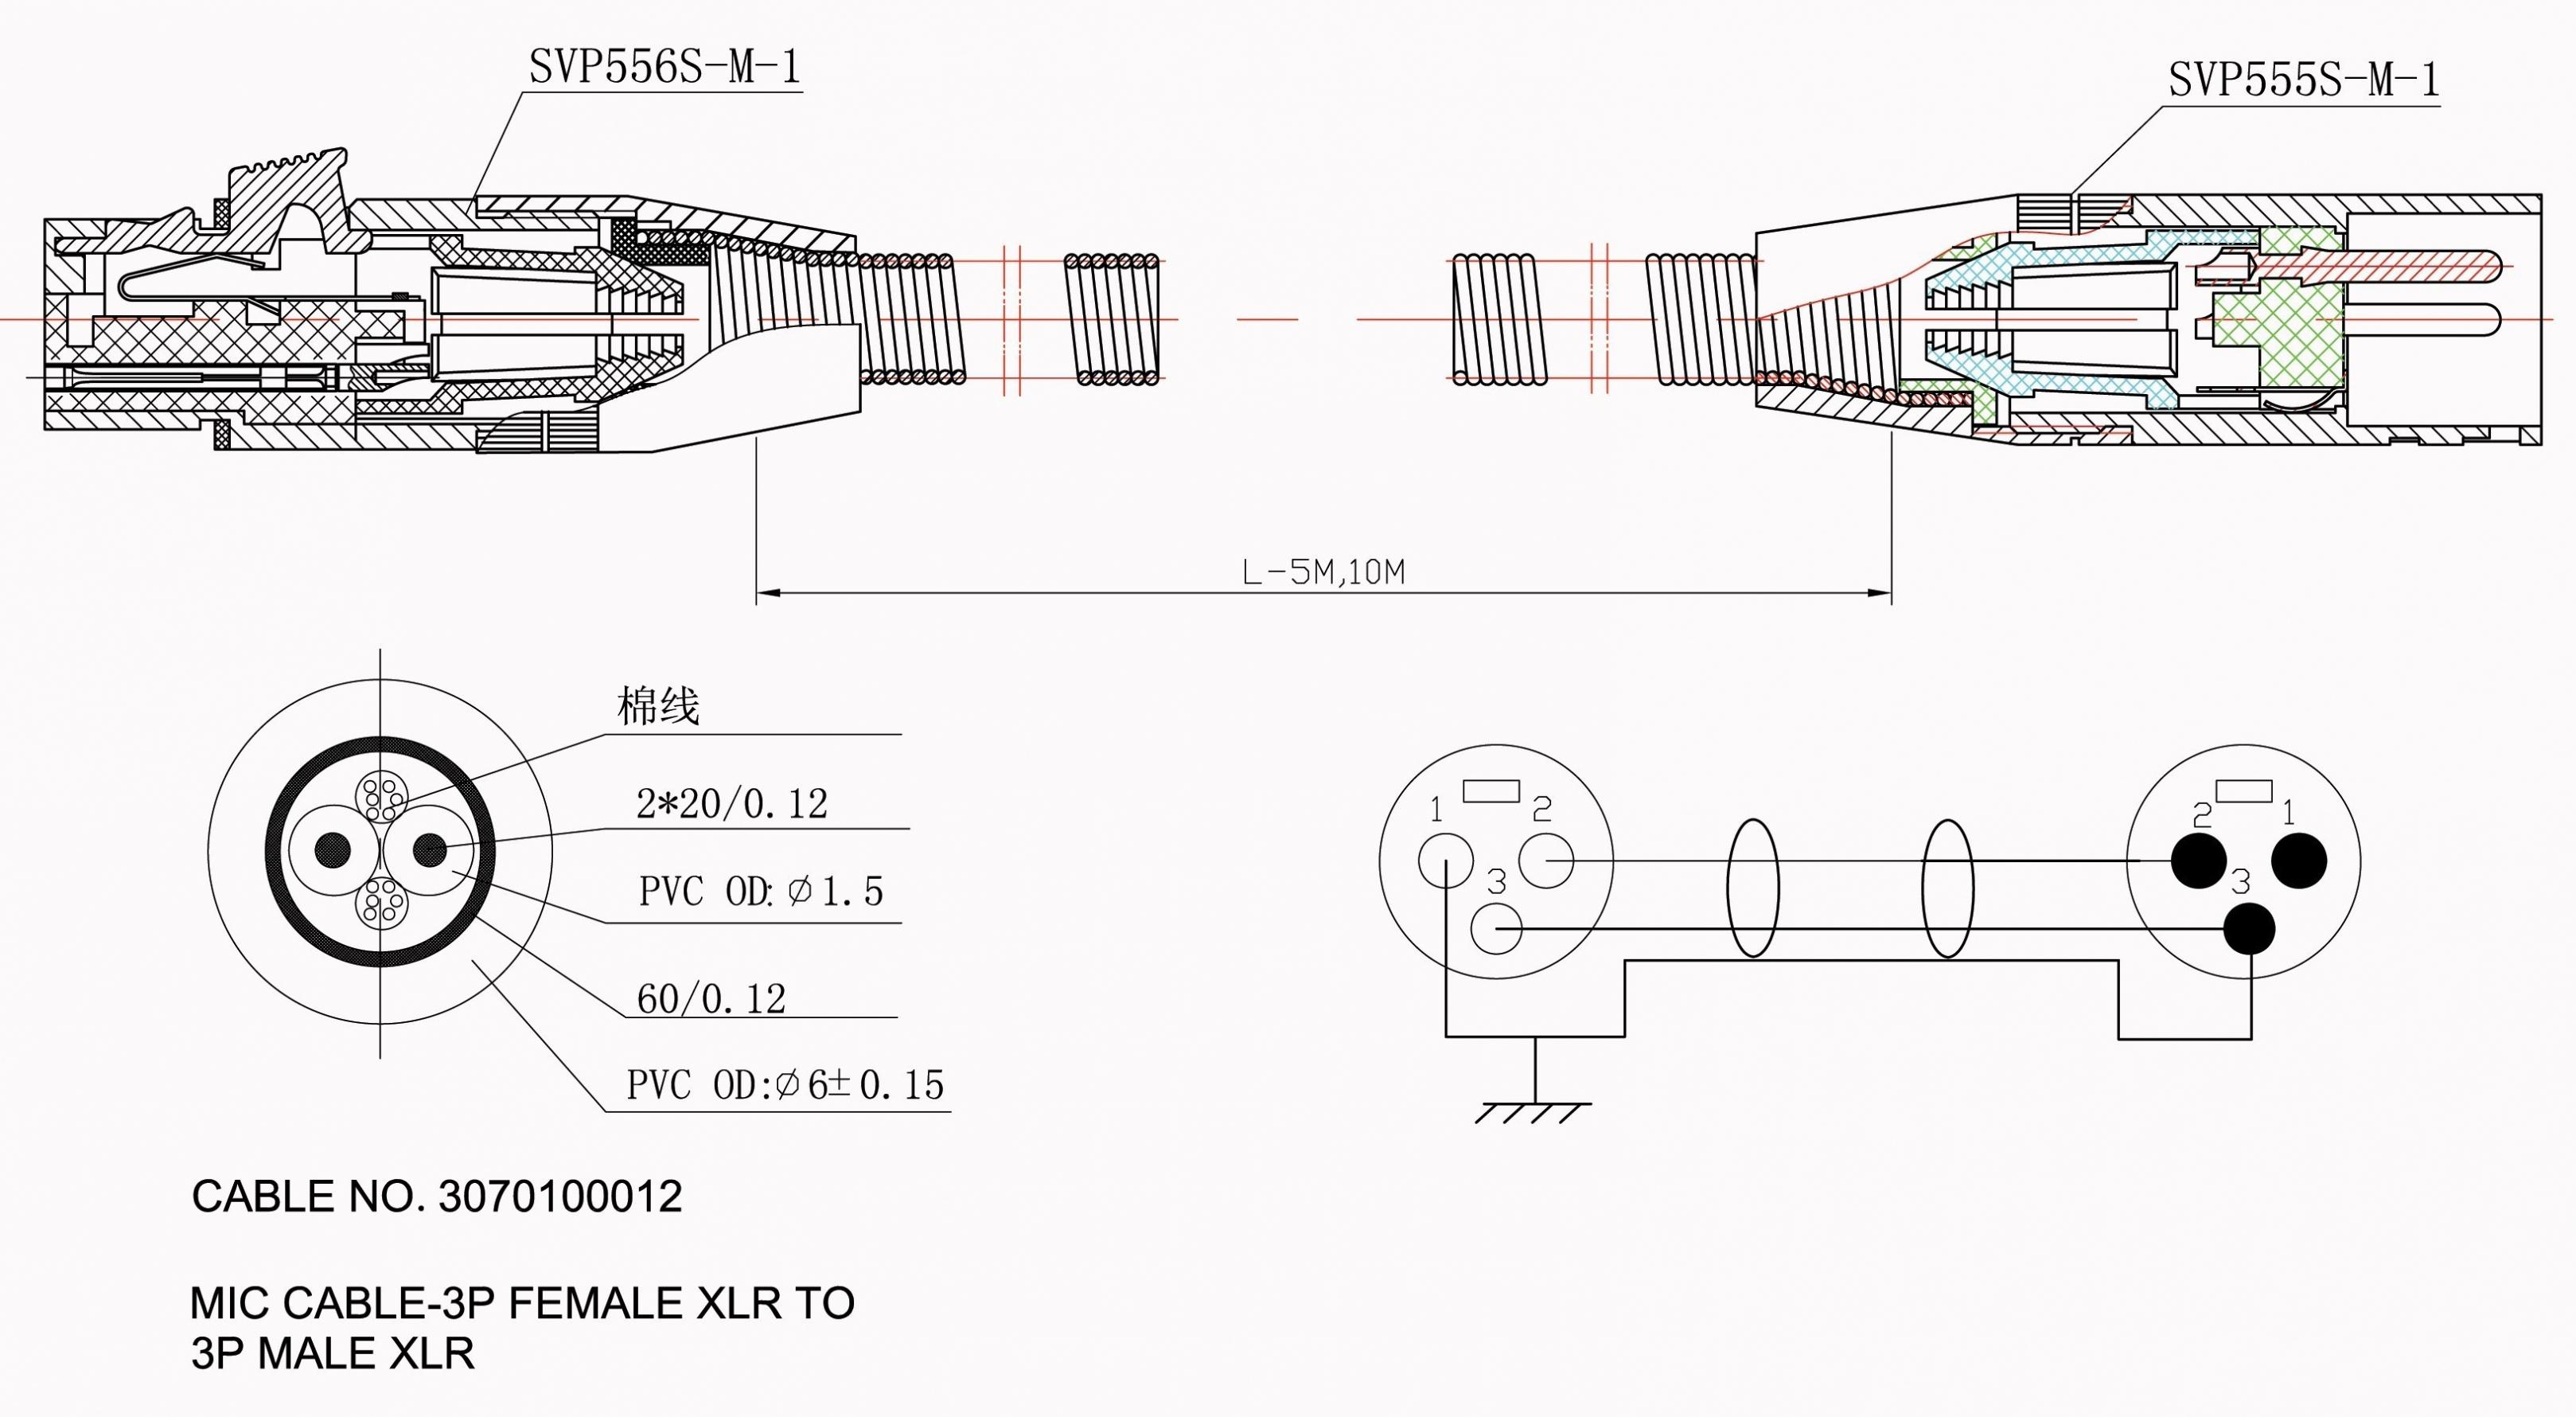 Diagram Wiring Diagram Glow Plug Relay 7 3 Full Version Hd Quality Relay 7 3 Diagramsfung Noidimontegiorgio It